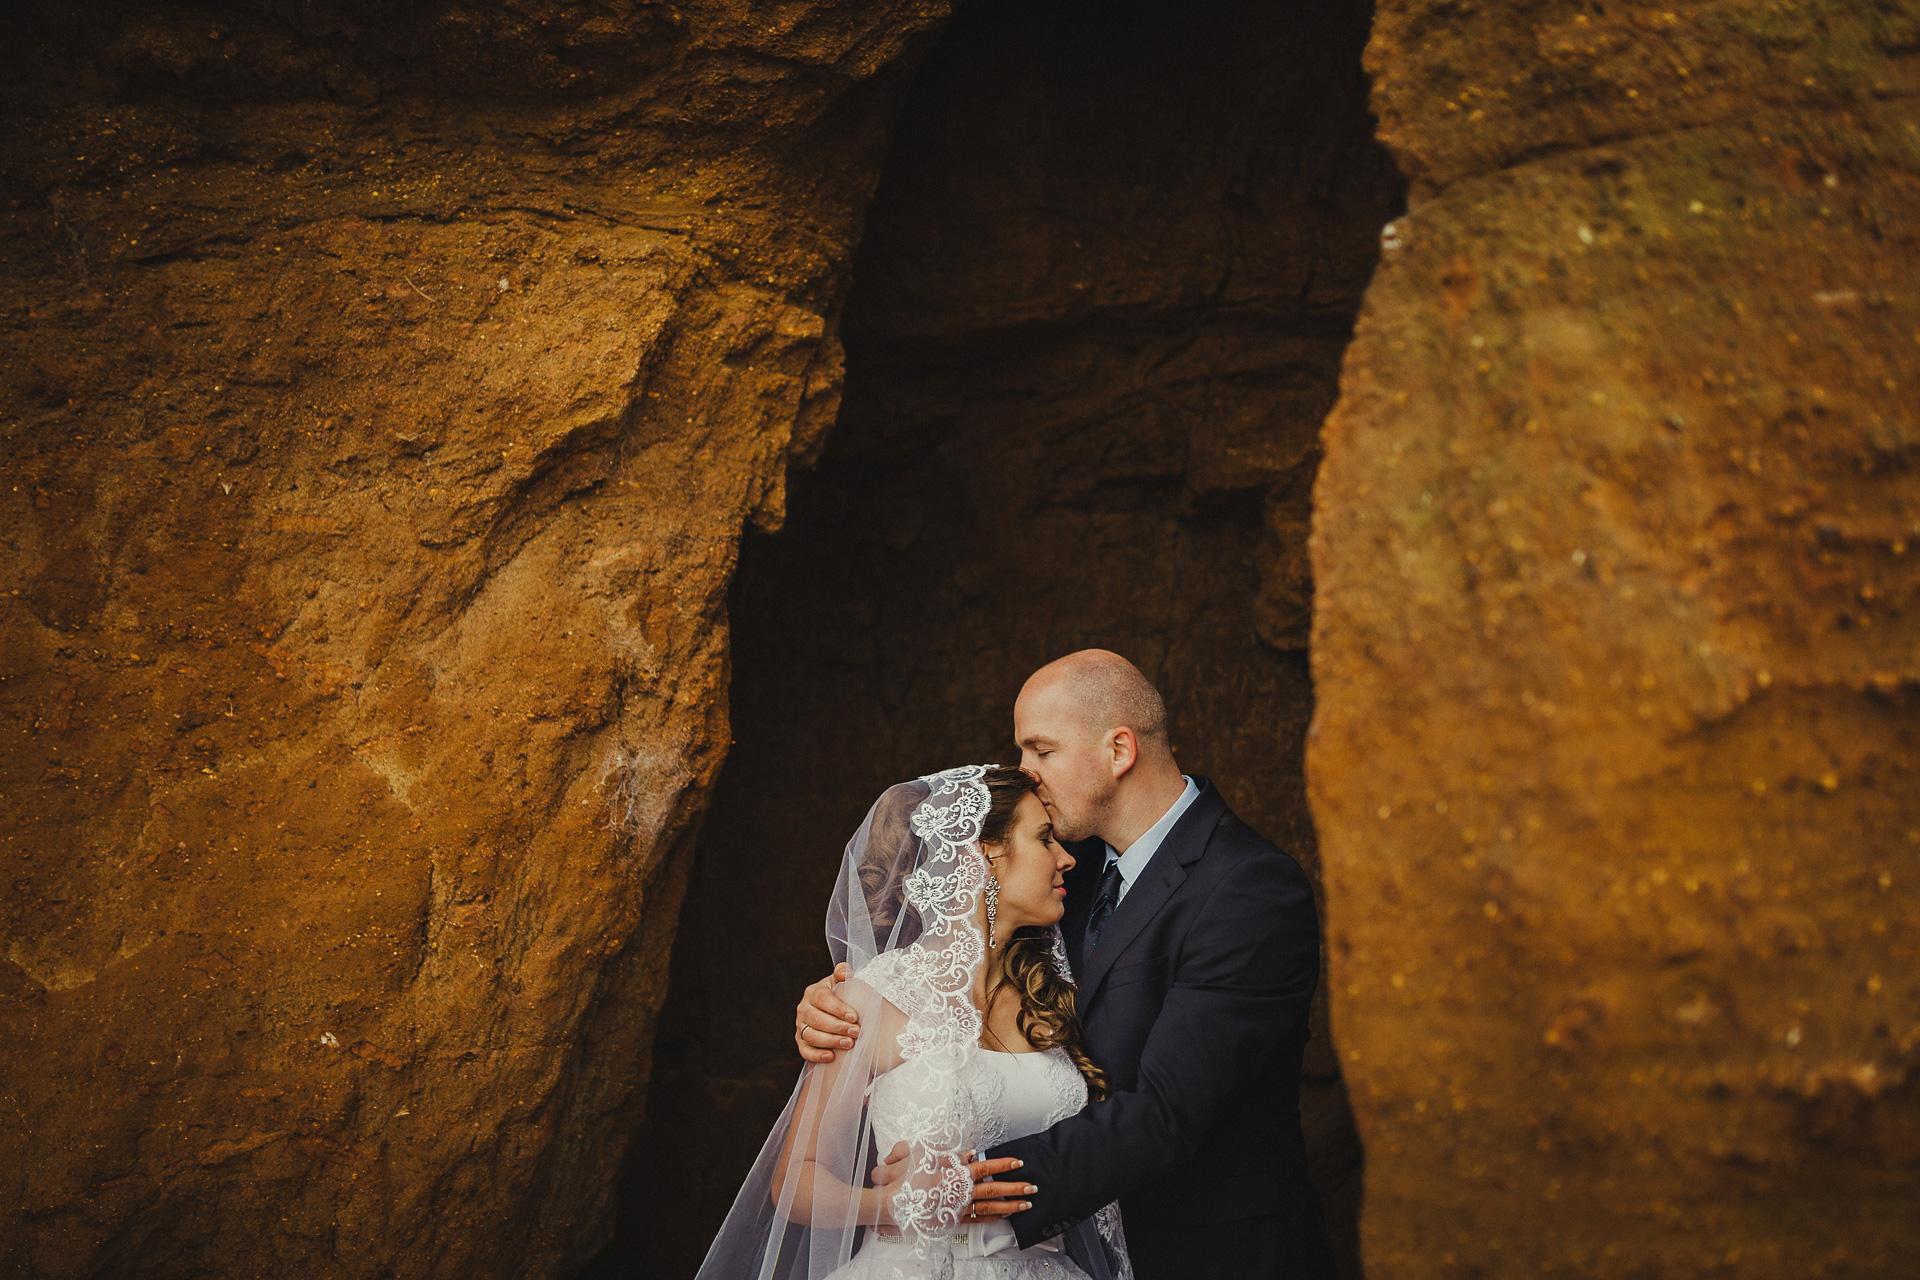 wedding destination svadba slovakia slovensko england uk eu pavo